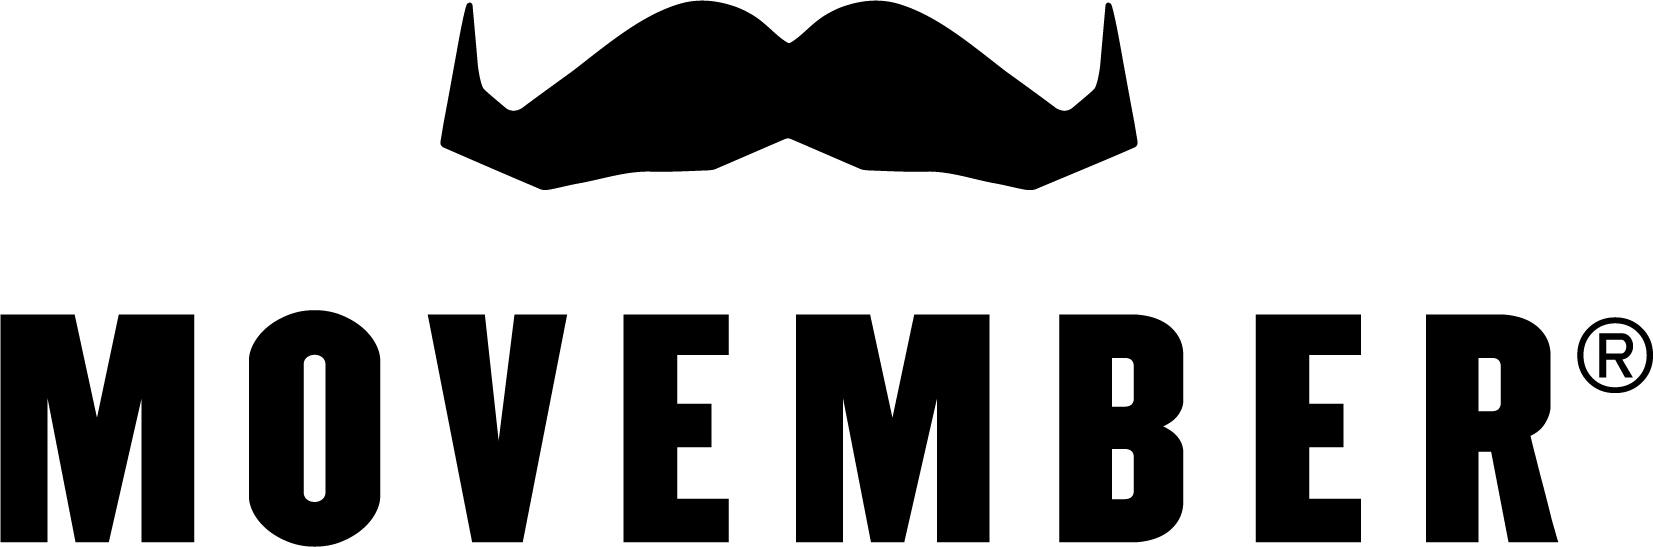 MoRunning 5k 10k mini MoRun MoRuns across the UK and Ireland supporting Movember Foundation